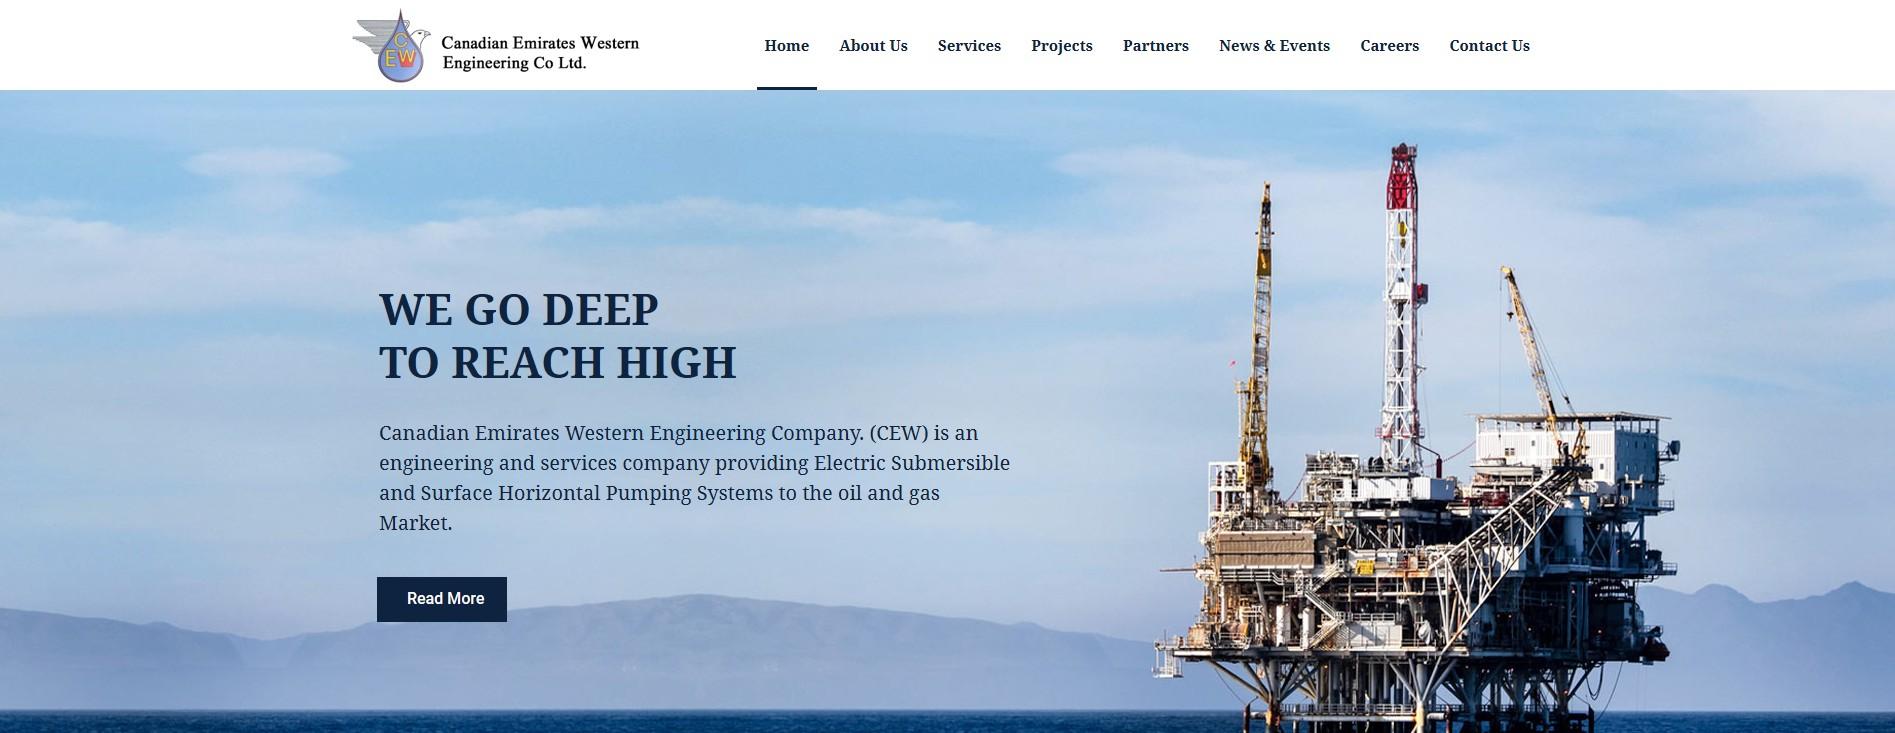 Canadian Emirates Western Engineering Co LLC | LinkedIn